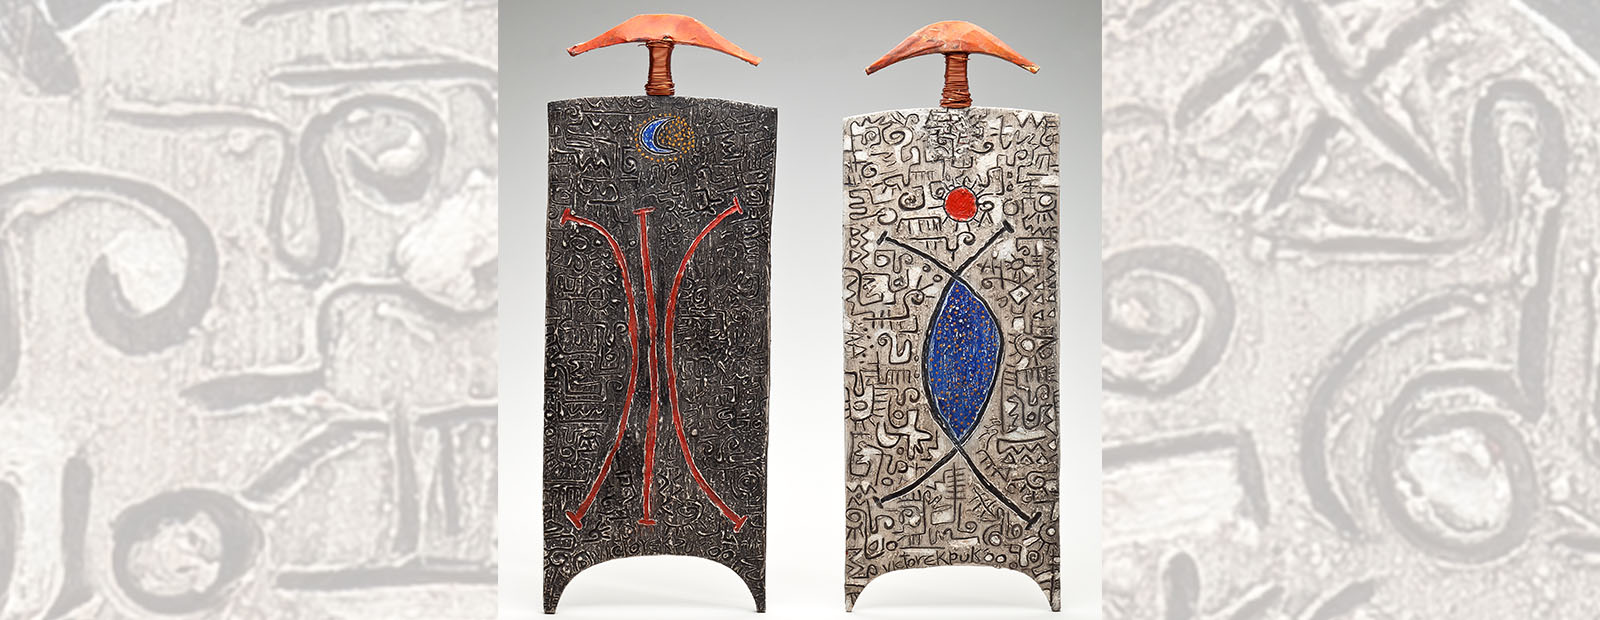 Qur'anic boards